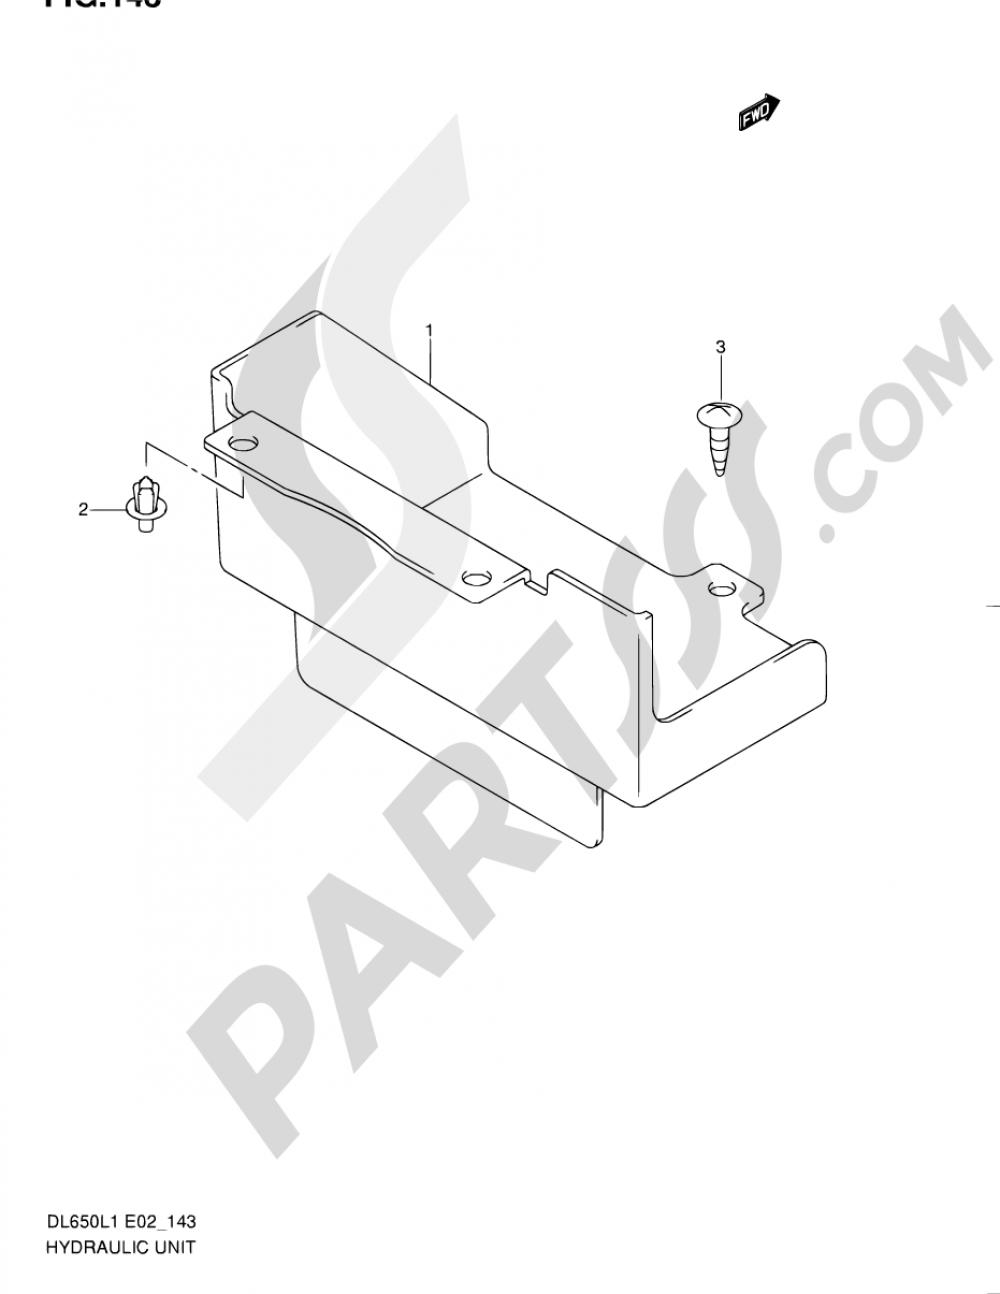 143 - HYDRAULIC UNIT (DL650L1 E24) Suzuki VSTROM DL650A 2011